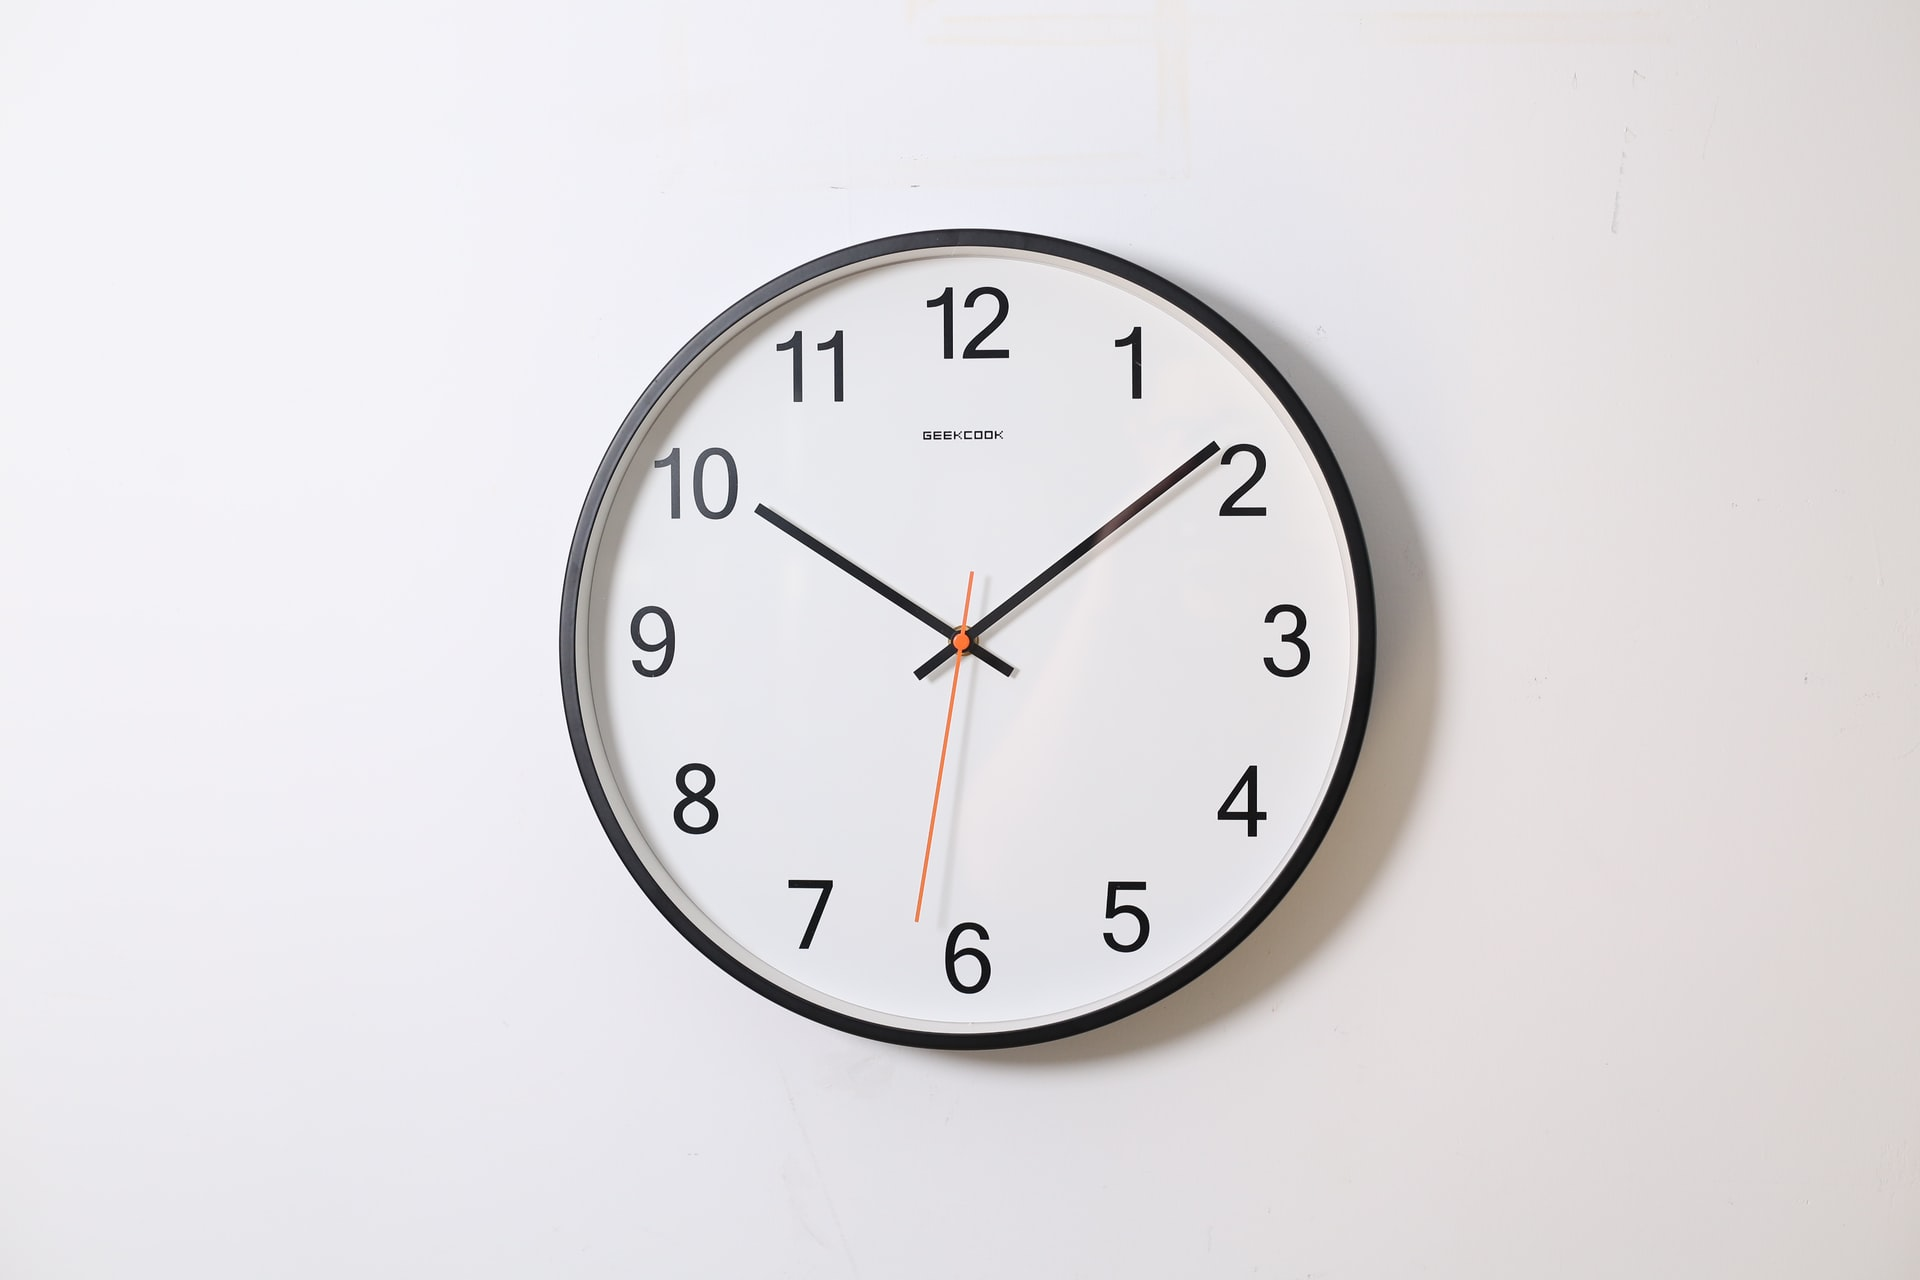 Kids will love some amusing jokes on clocks.